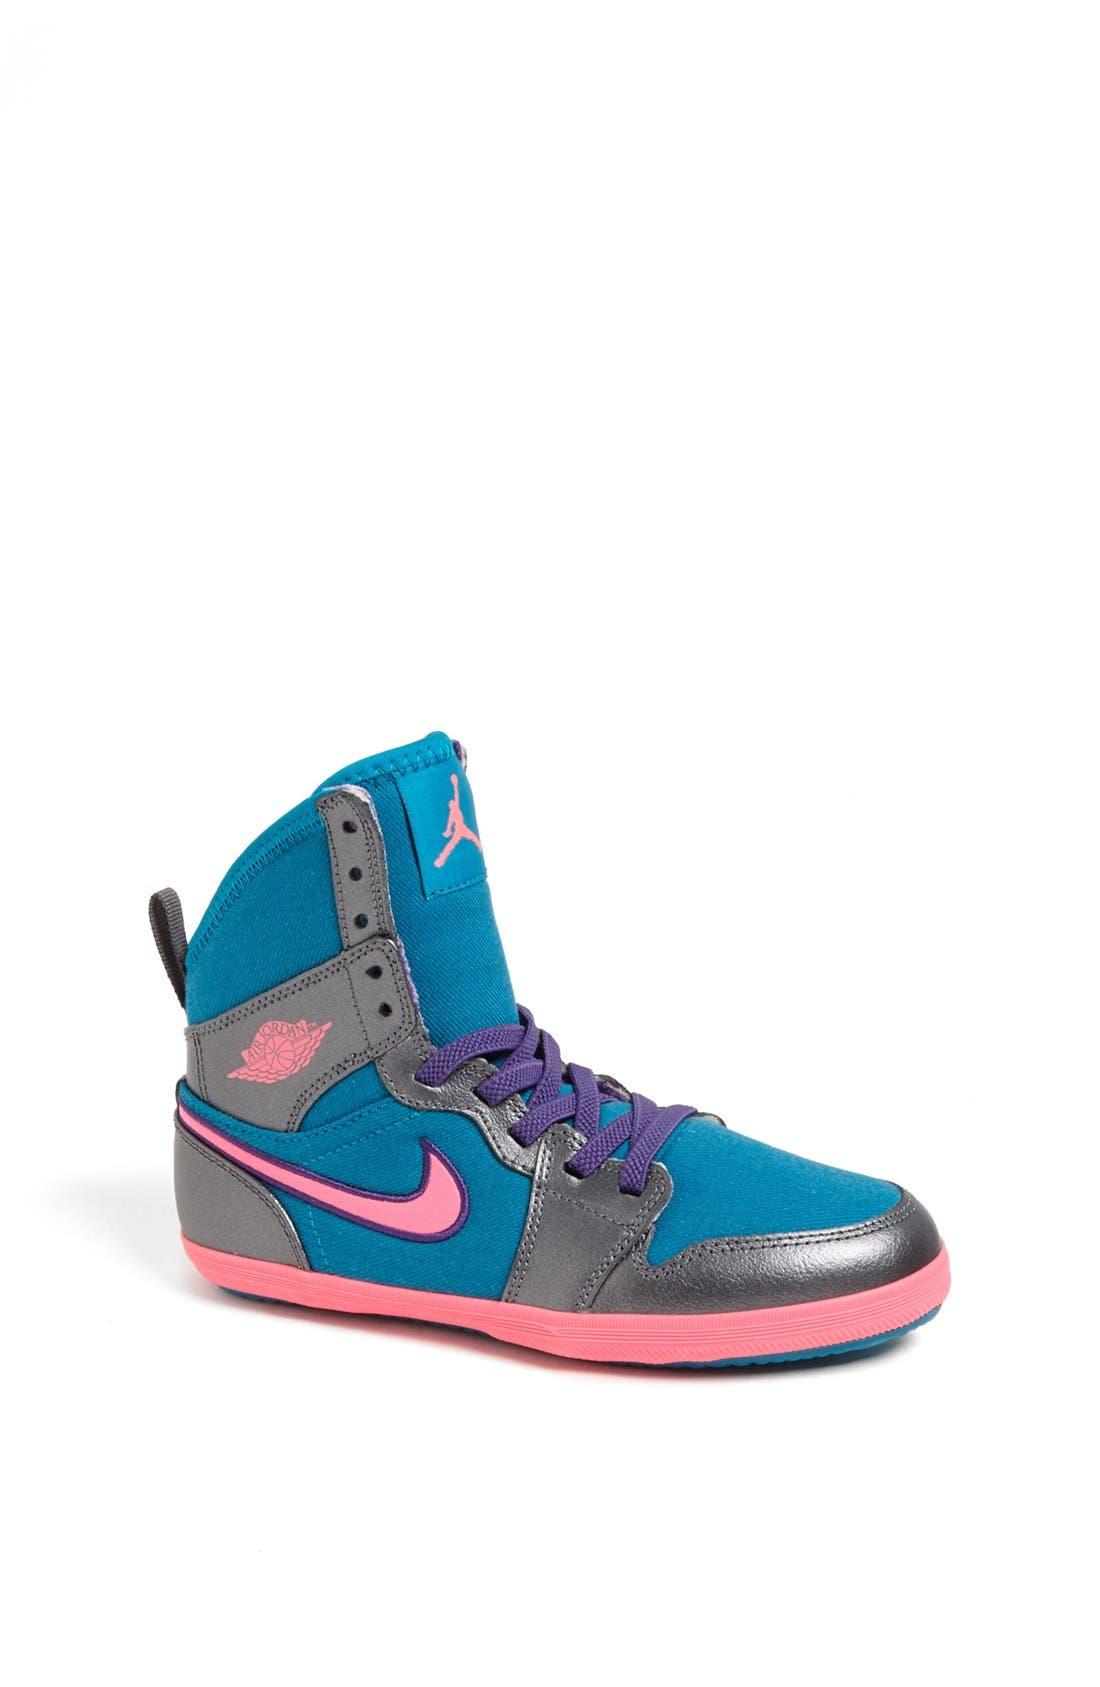 Alternate Image 1 Selected - Nike 'Jordan 1 Skinny High' Sneaker (Toddler & Little Kid)